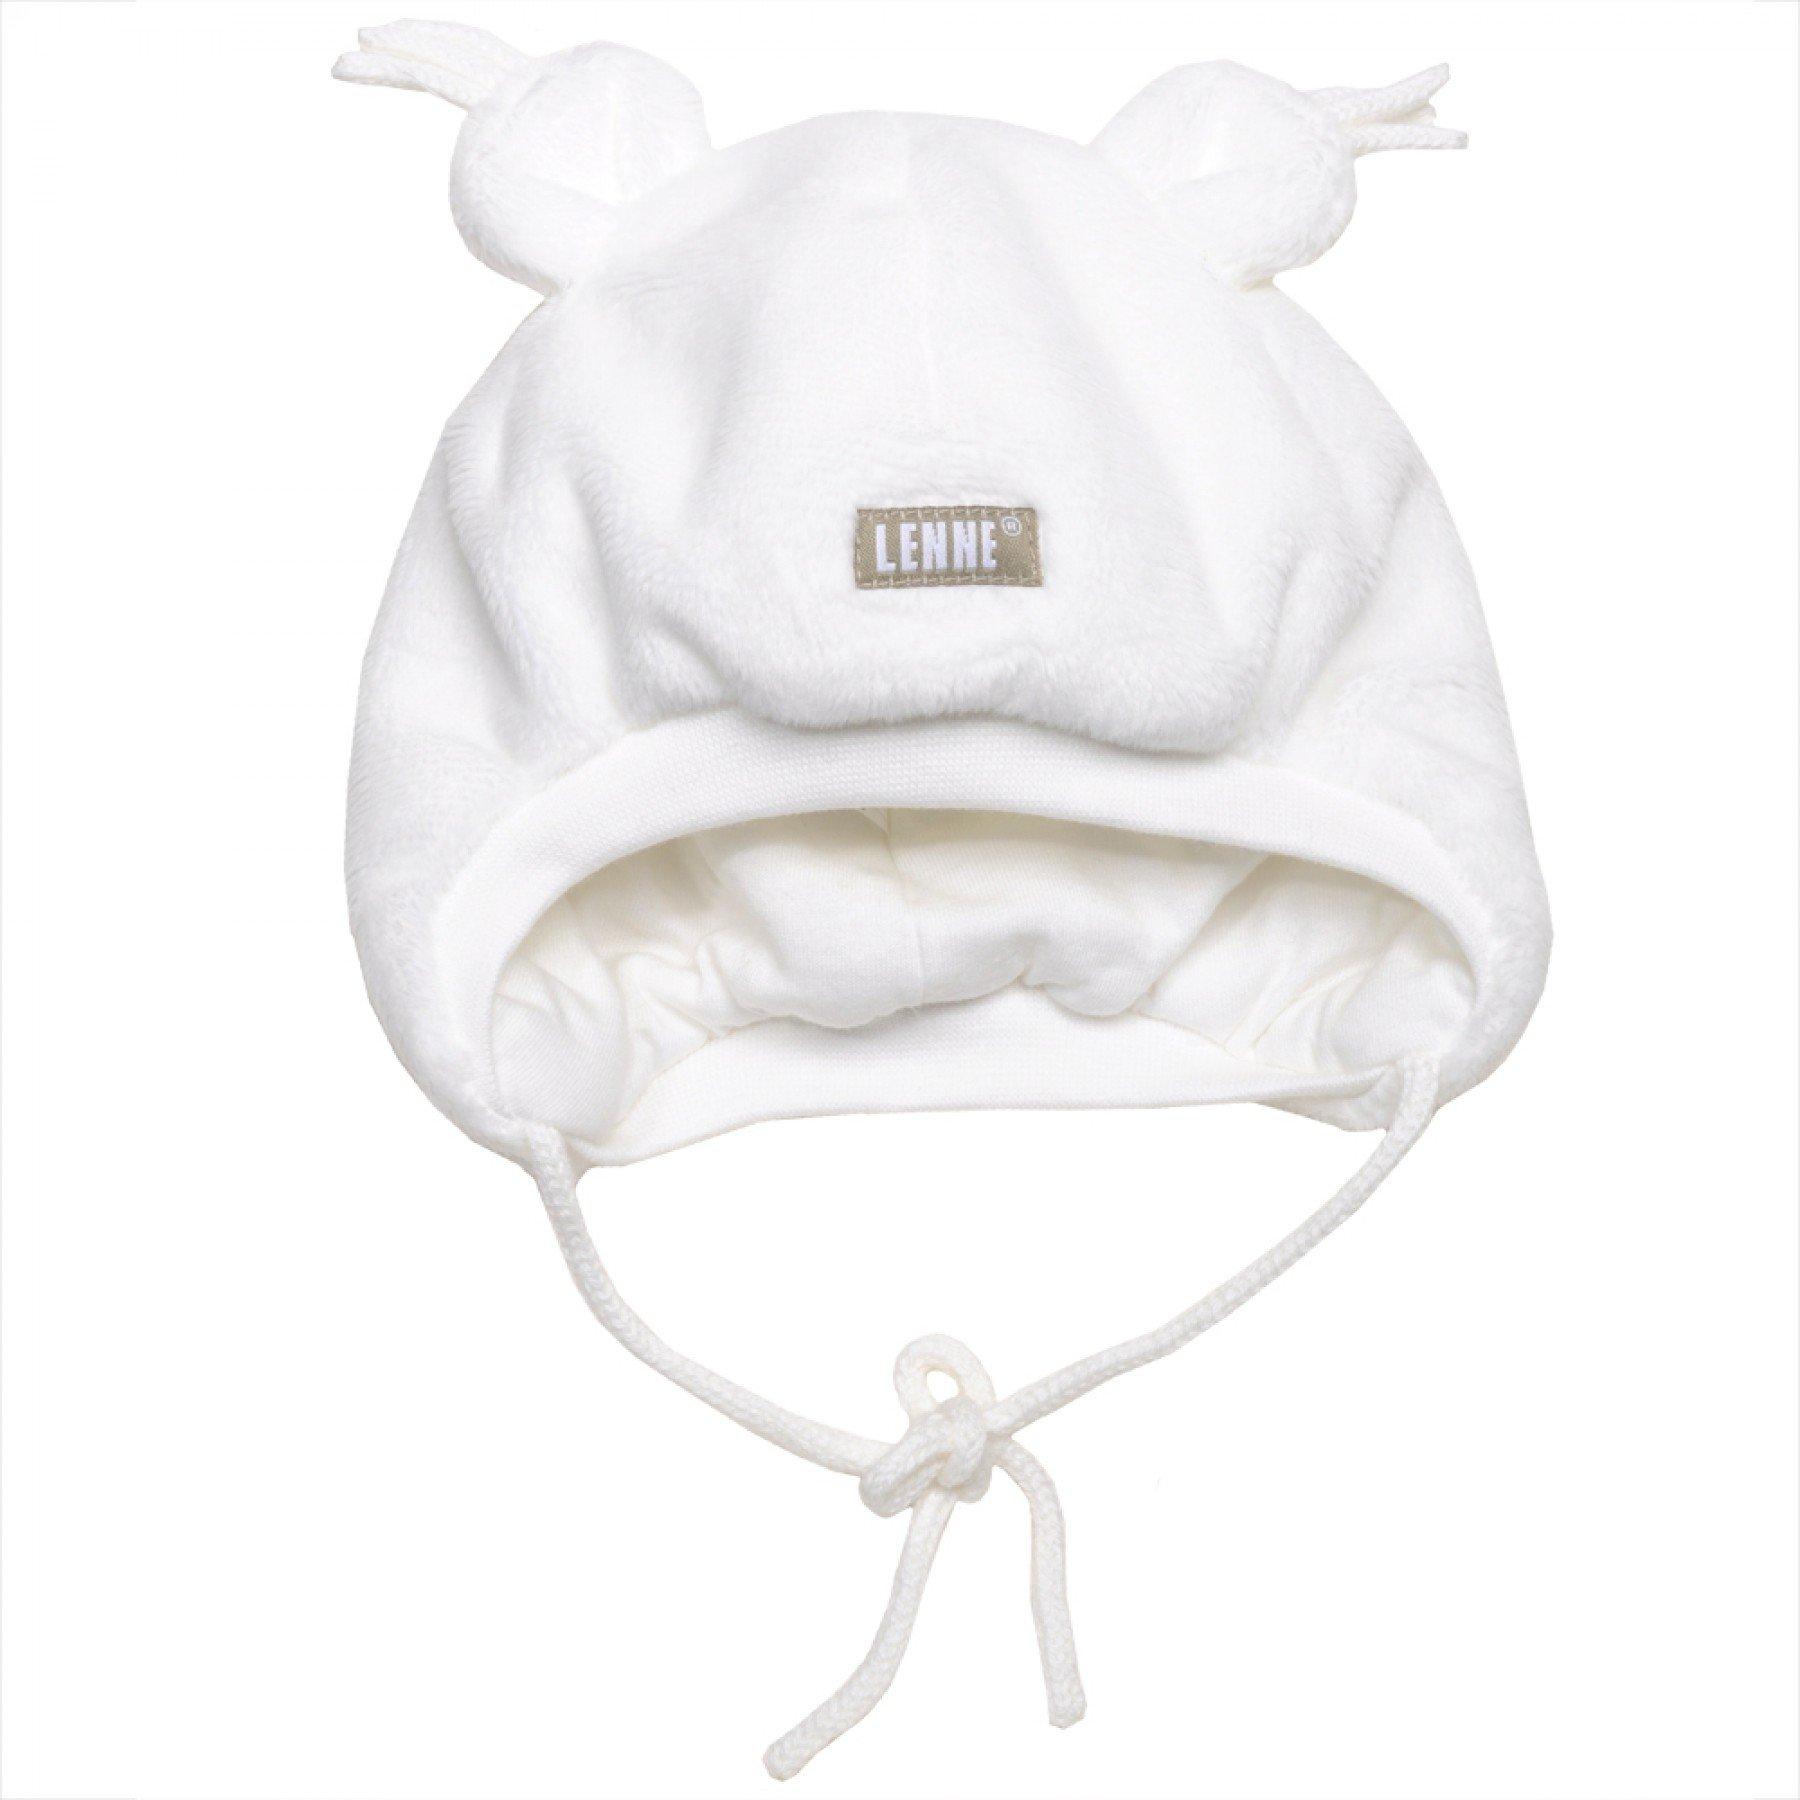 Lenne '17 Art.15371-16371/100 Berna Knitted hat Bērnu silta plīša cepure